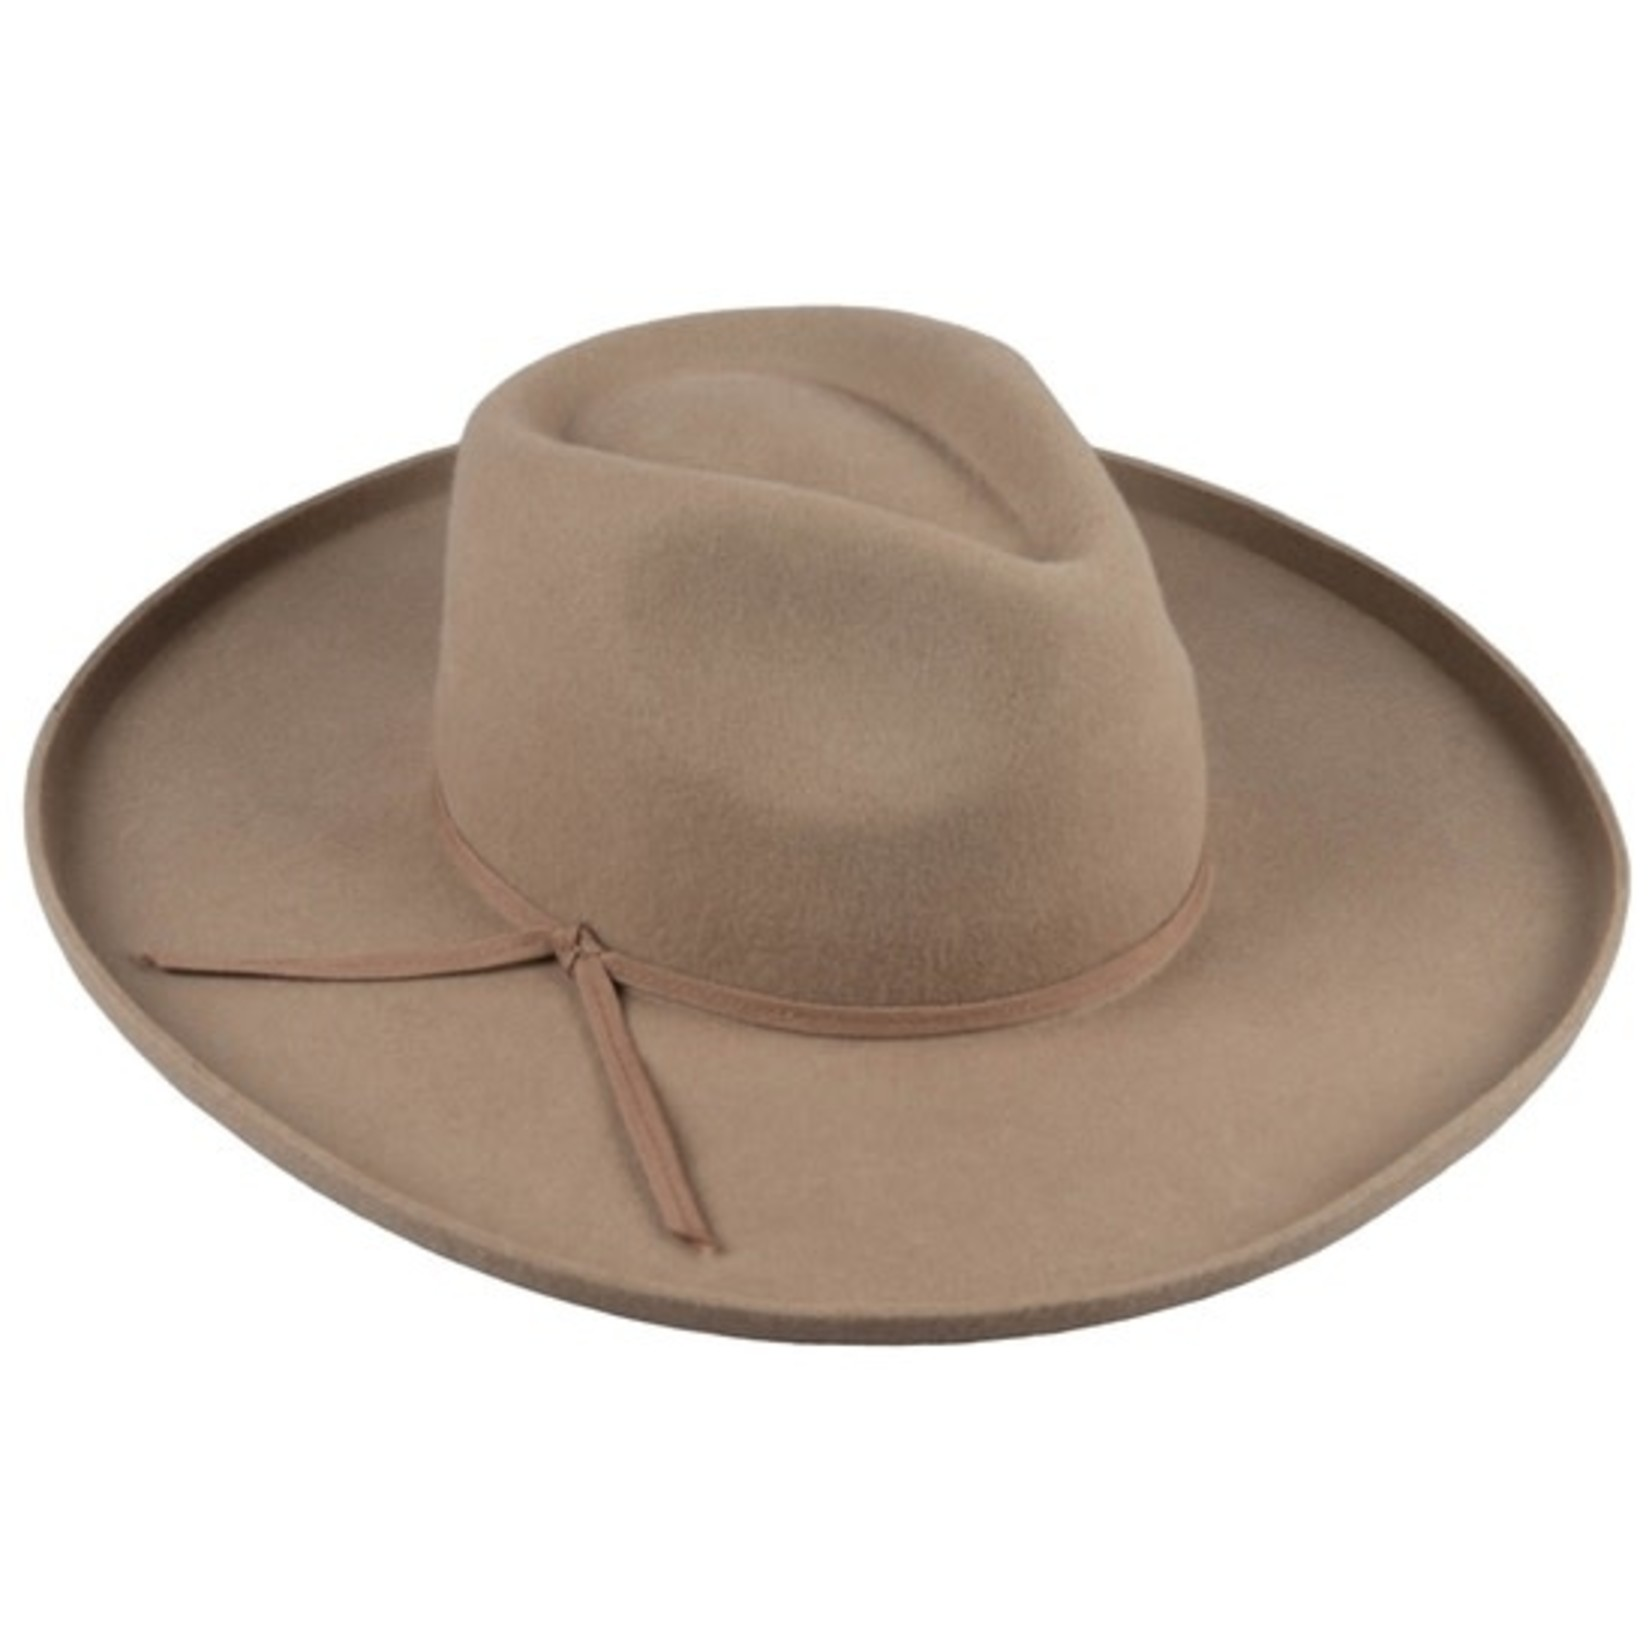 Wide Brim Hat in Brown